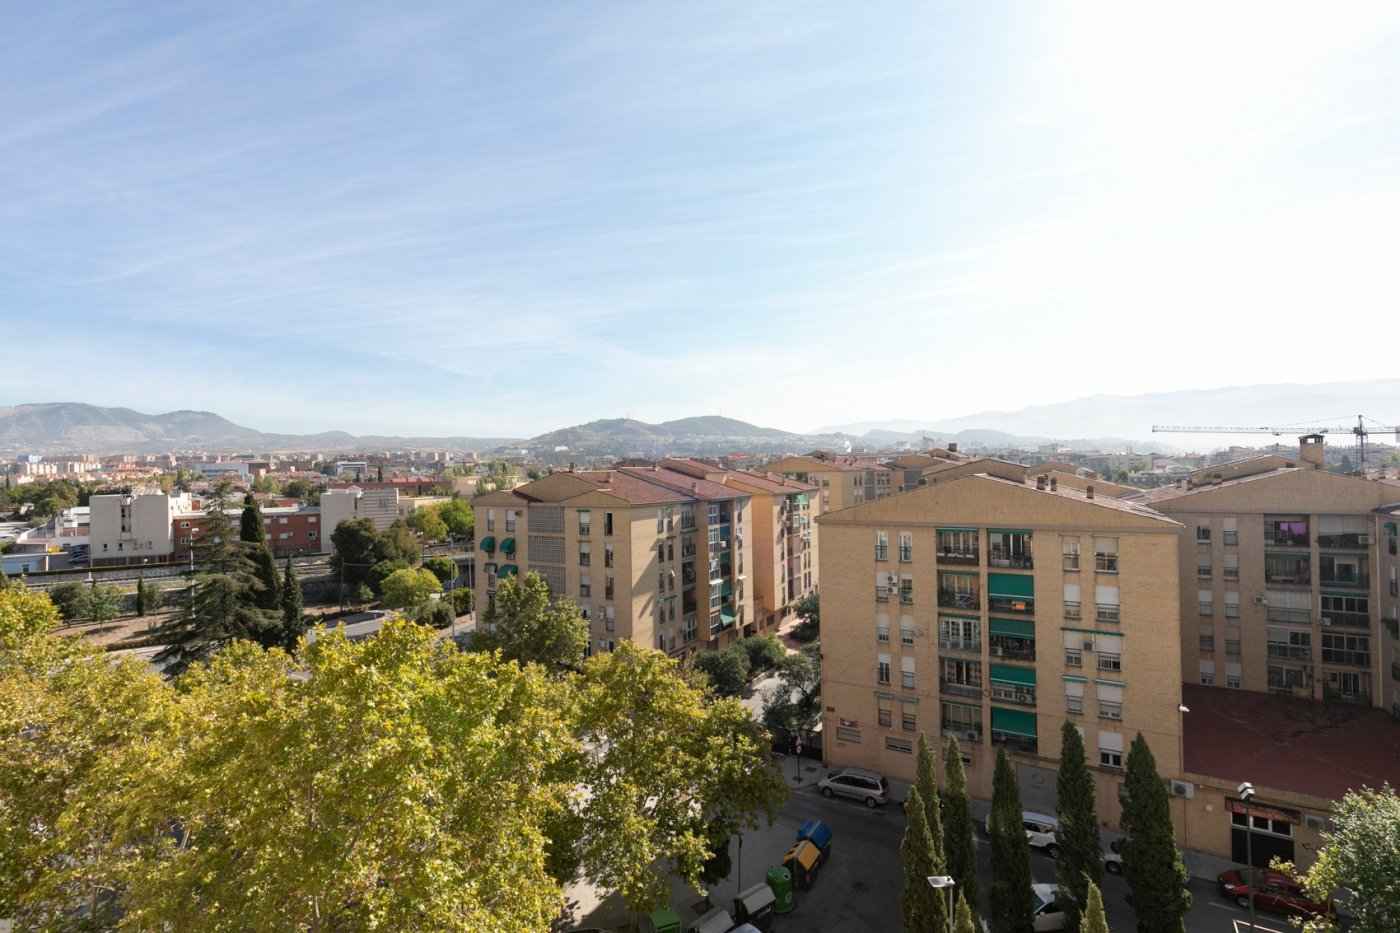 Piso semireformado frente Parque Almunia, Granada